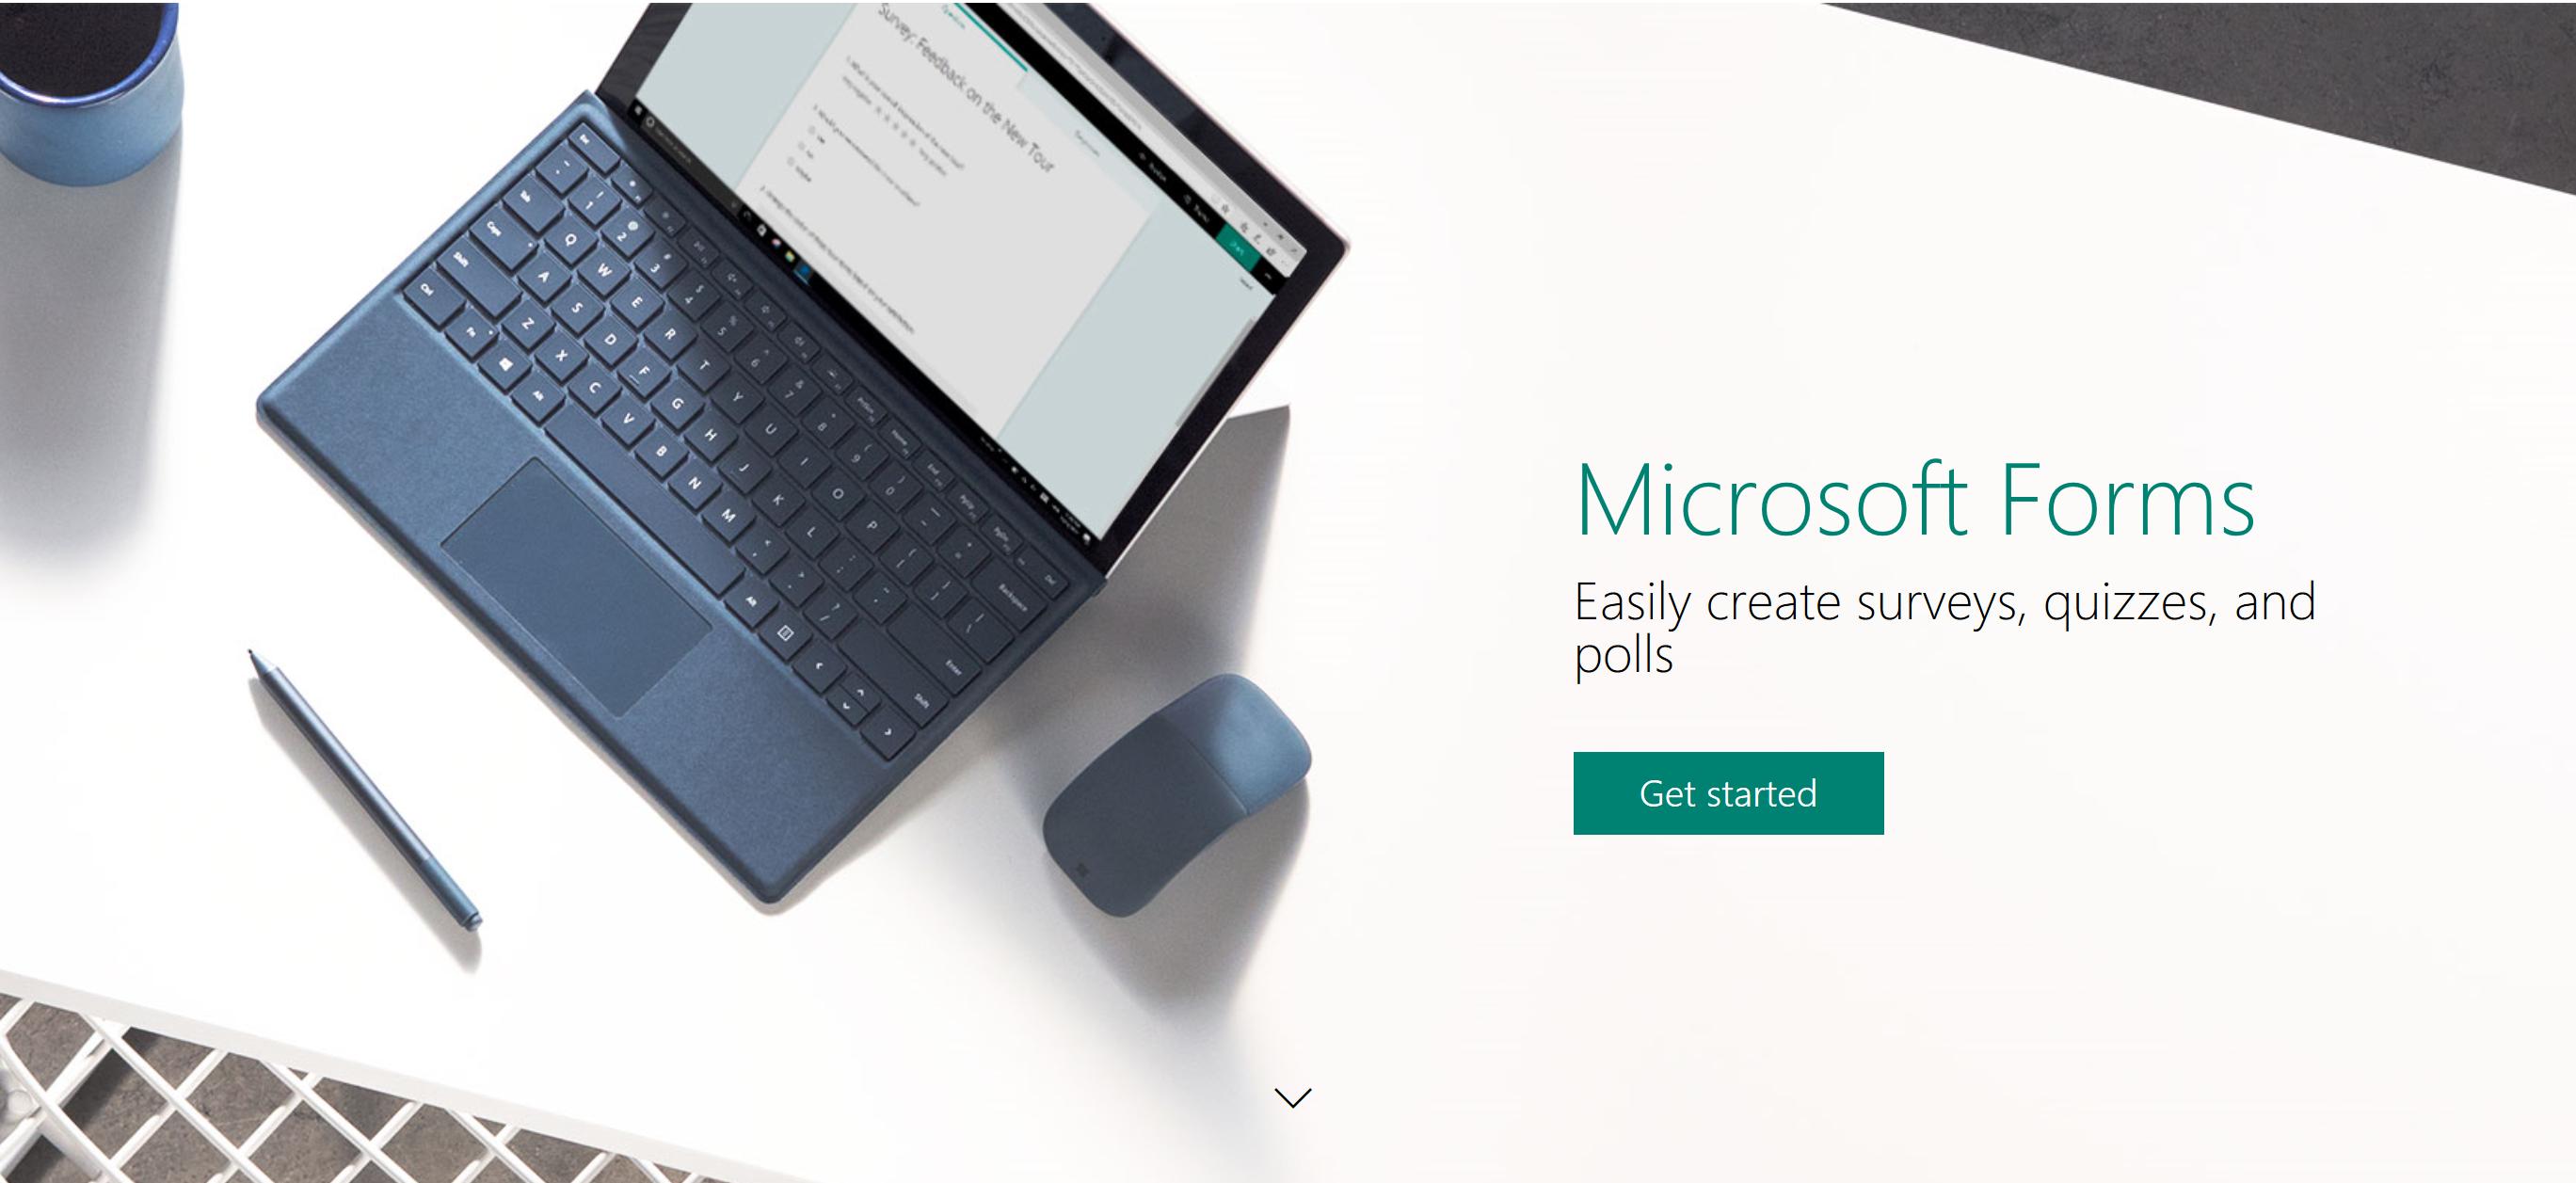 microsoft forms in education microsoft tech community 147193